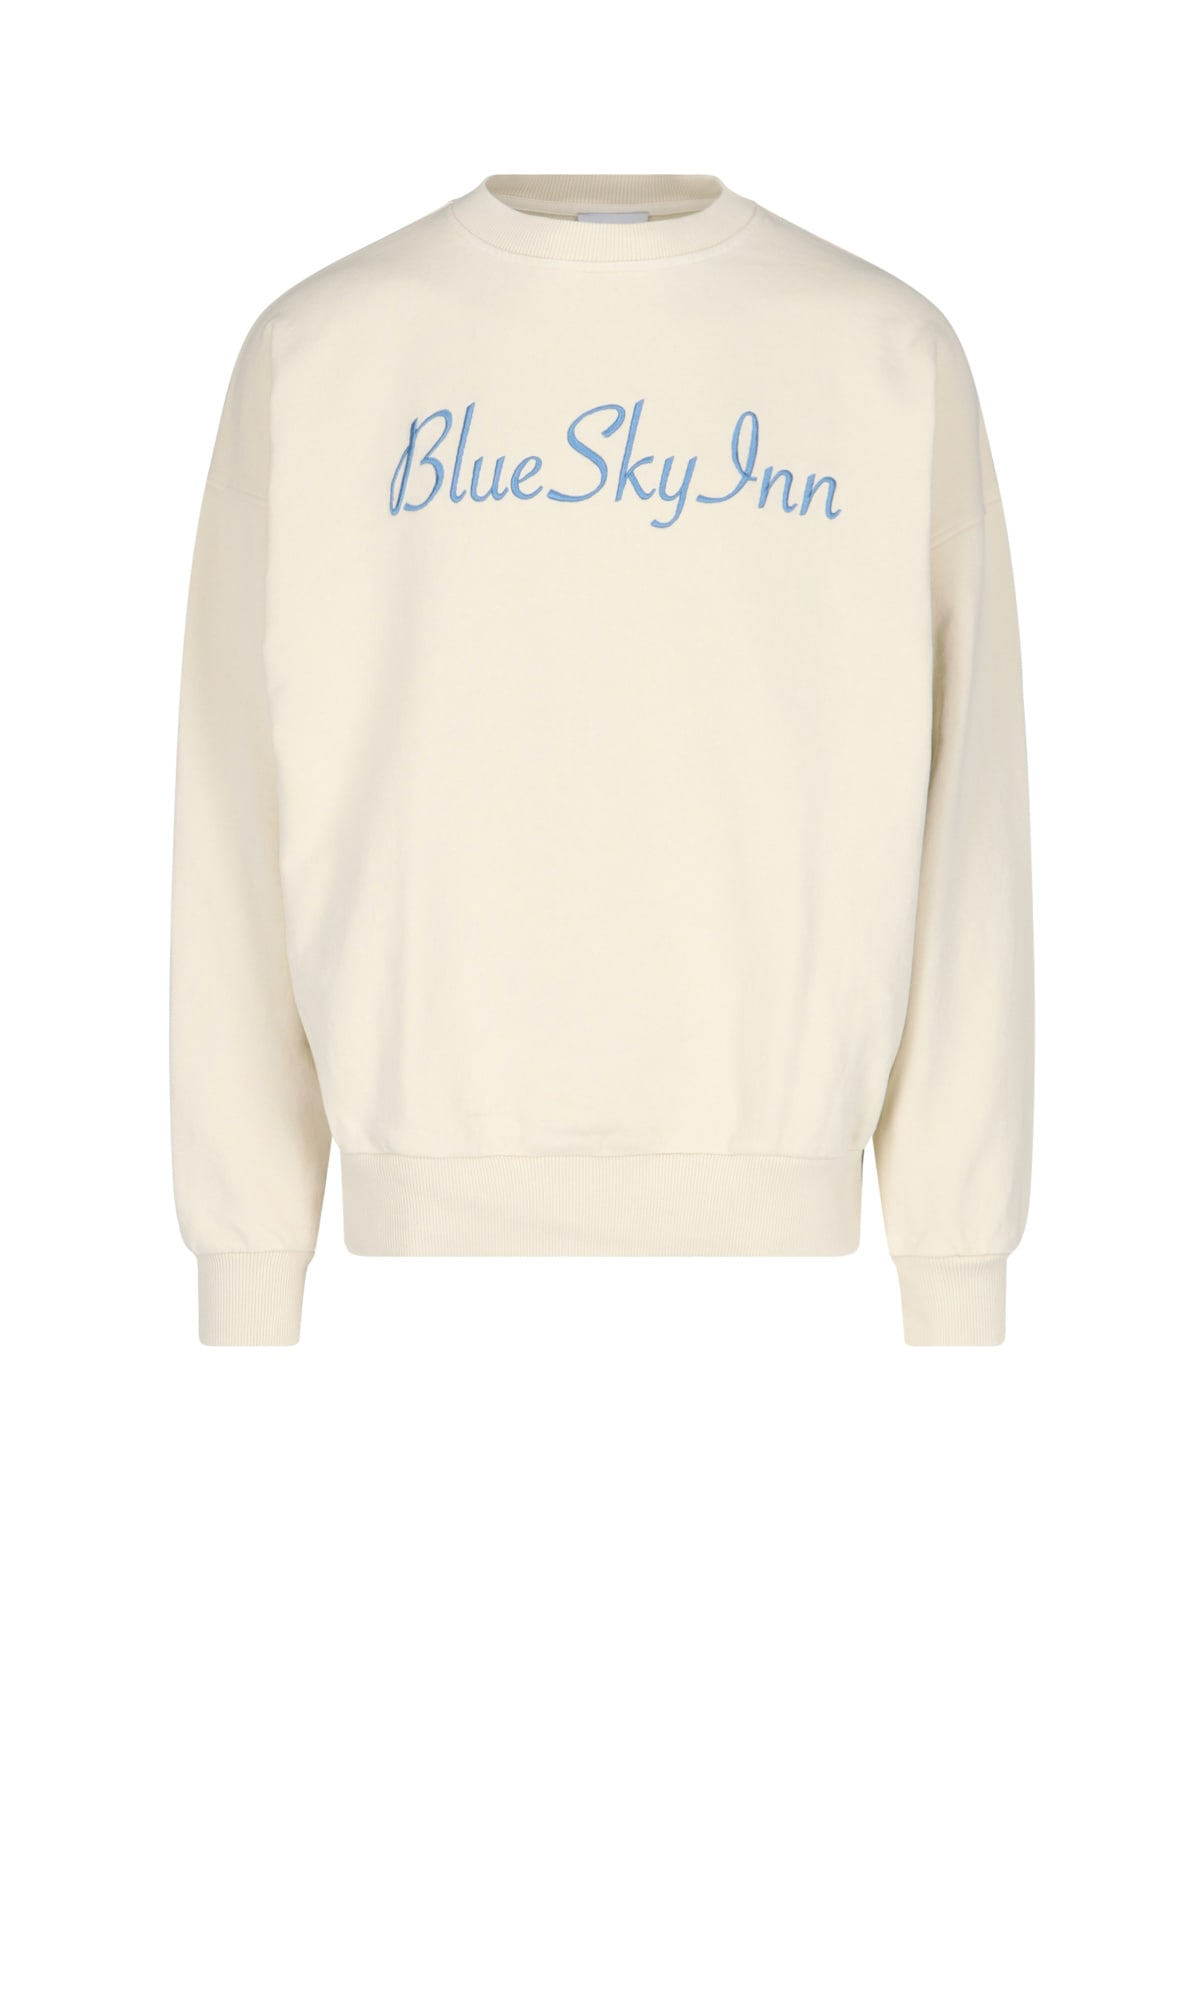 Blue Sky Inn Sweater